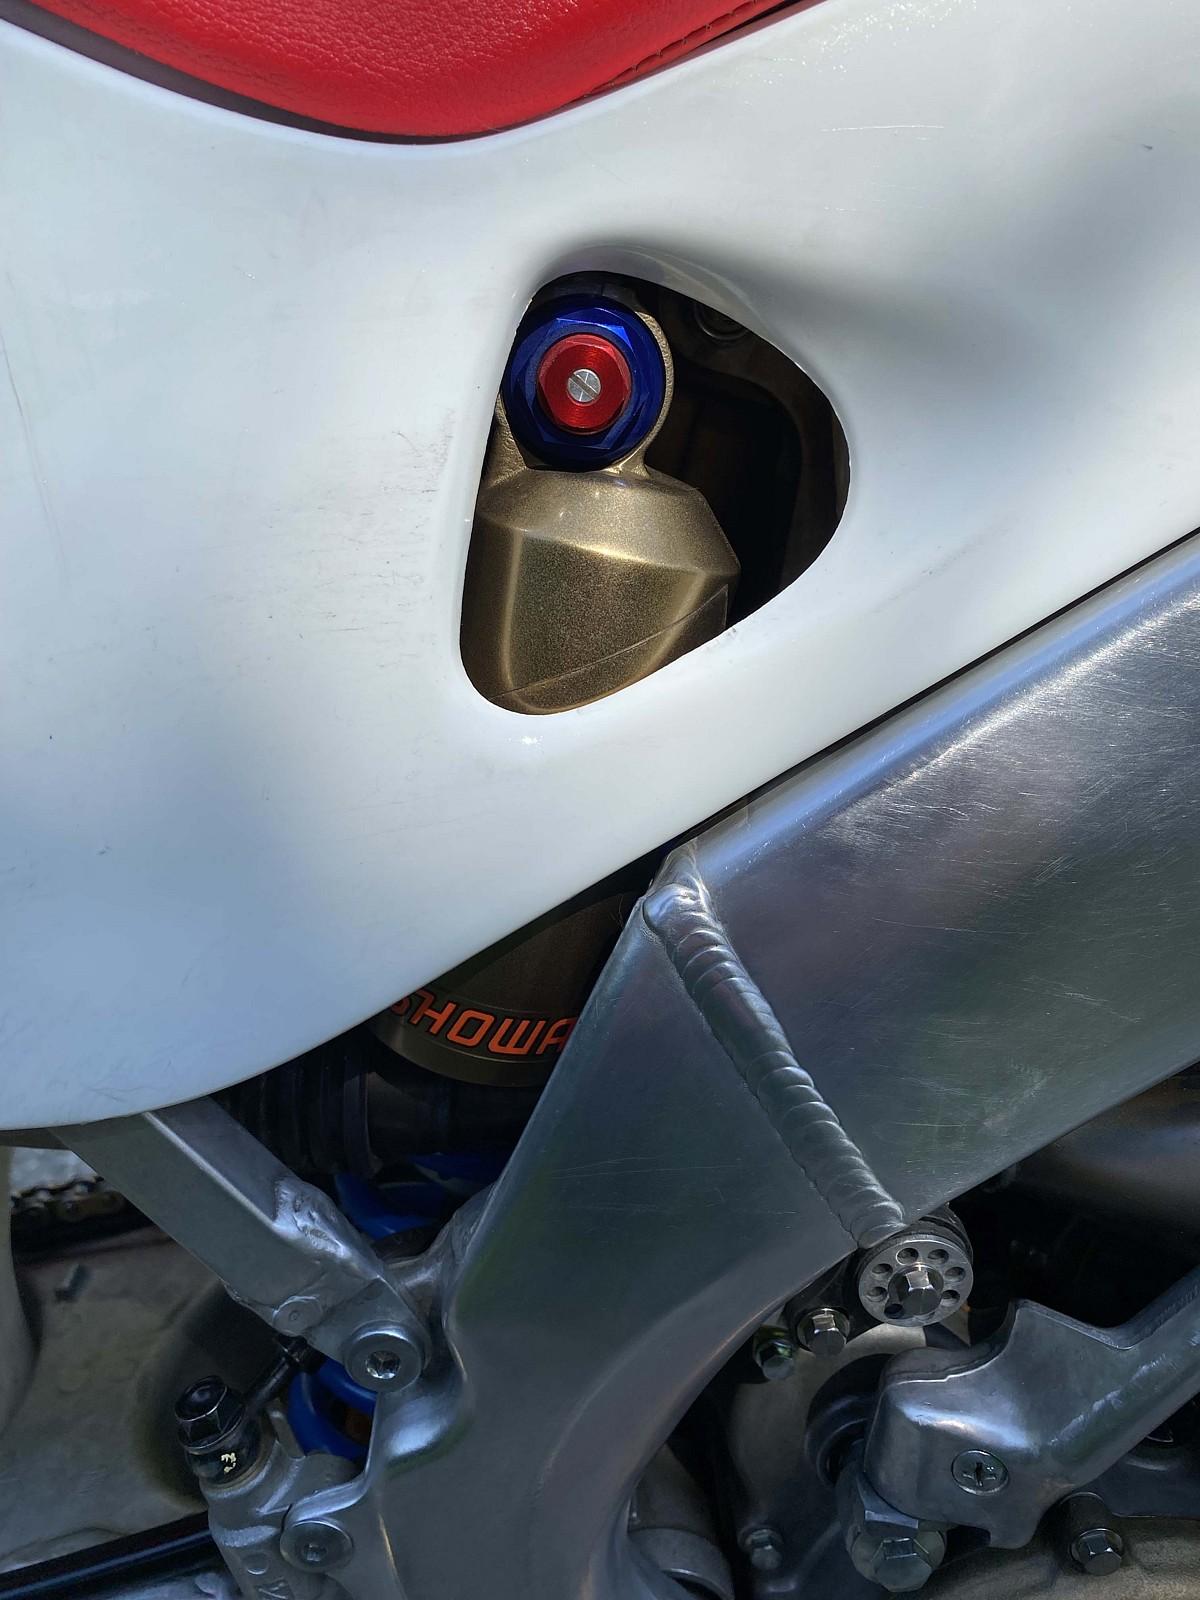 Rear SHOWA  - Debegio - Motocross Pictures - Vital MX